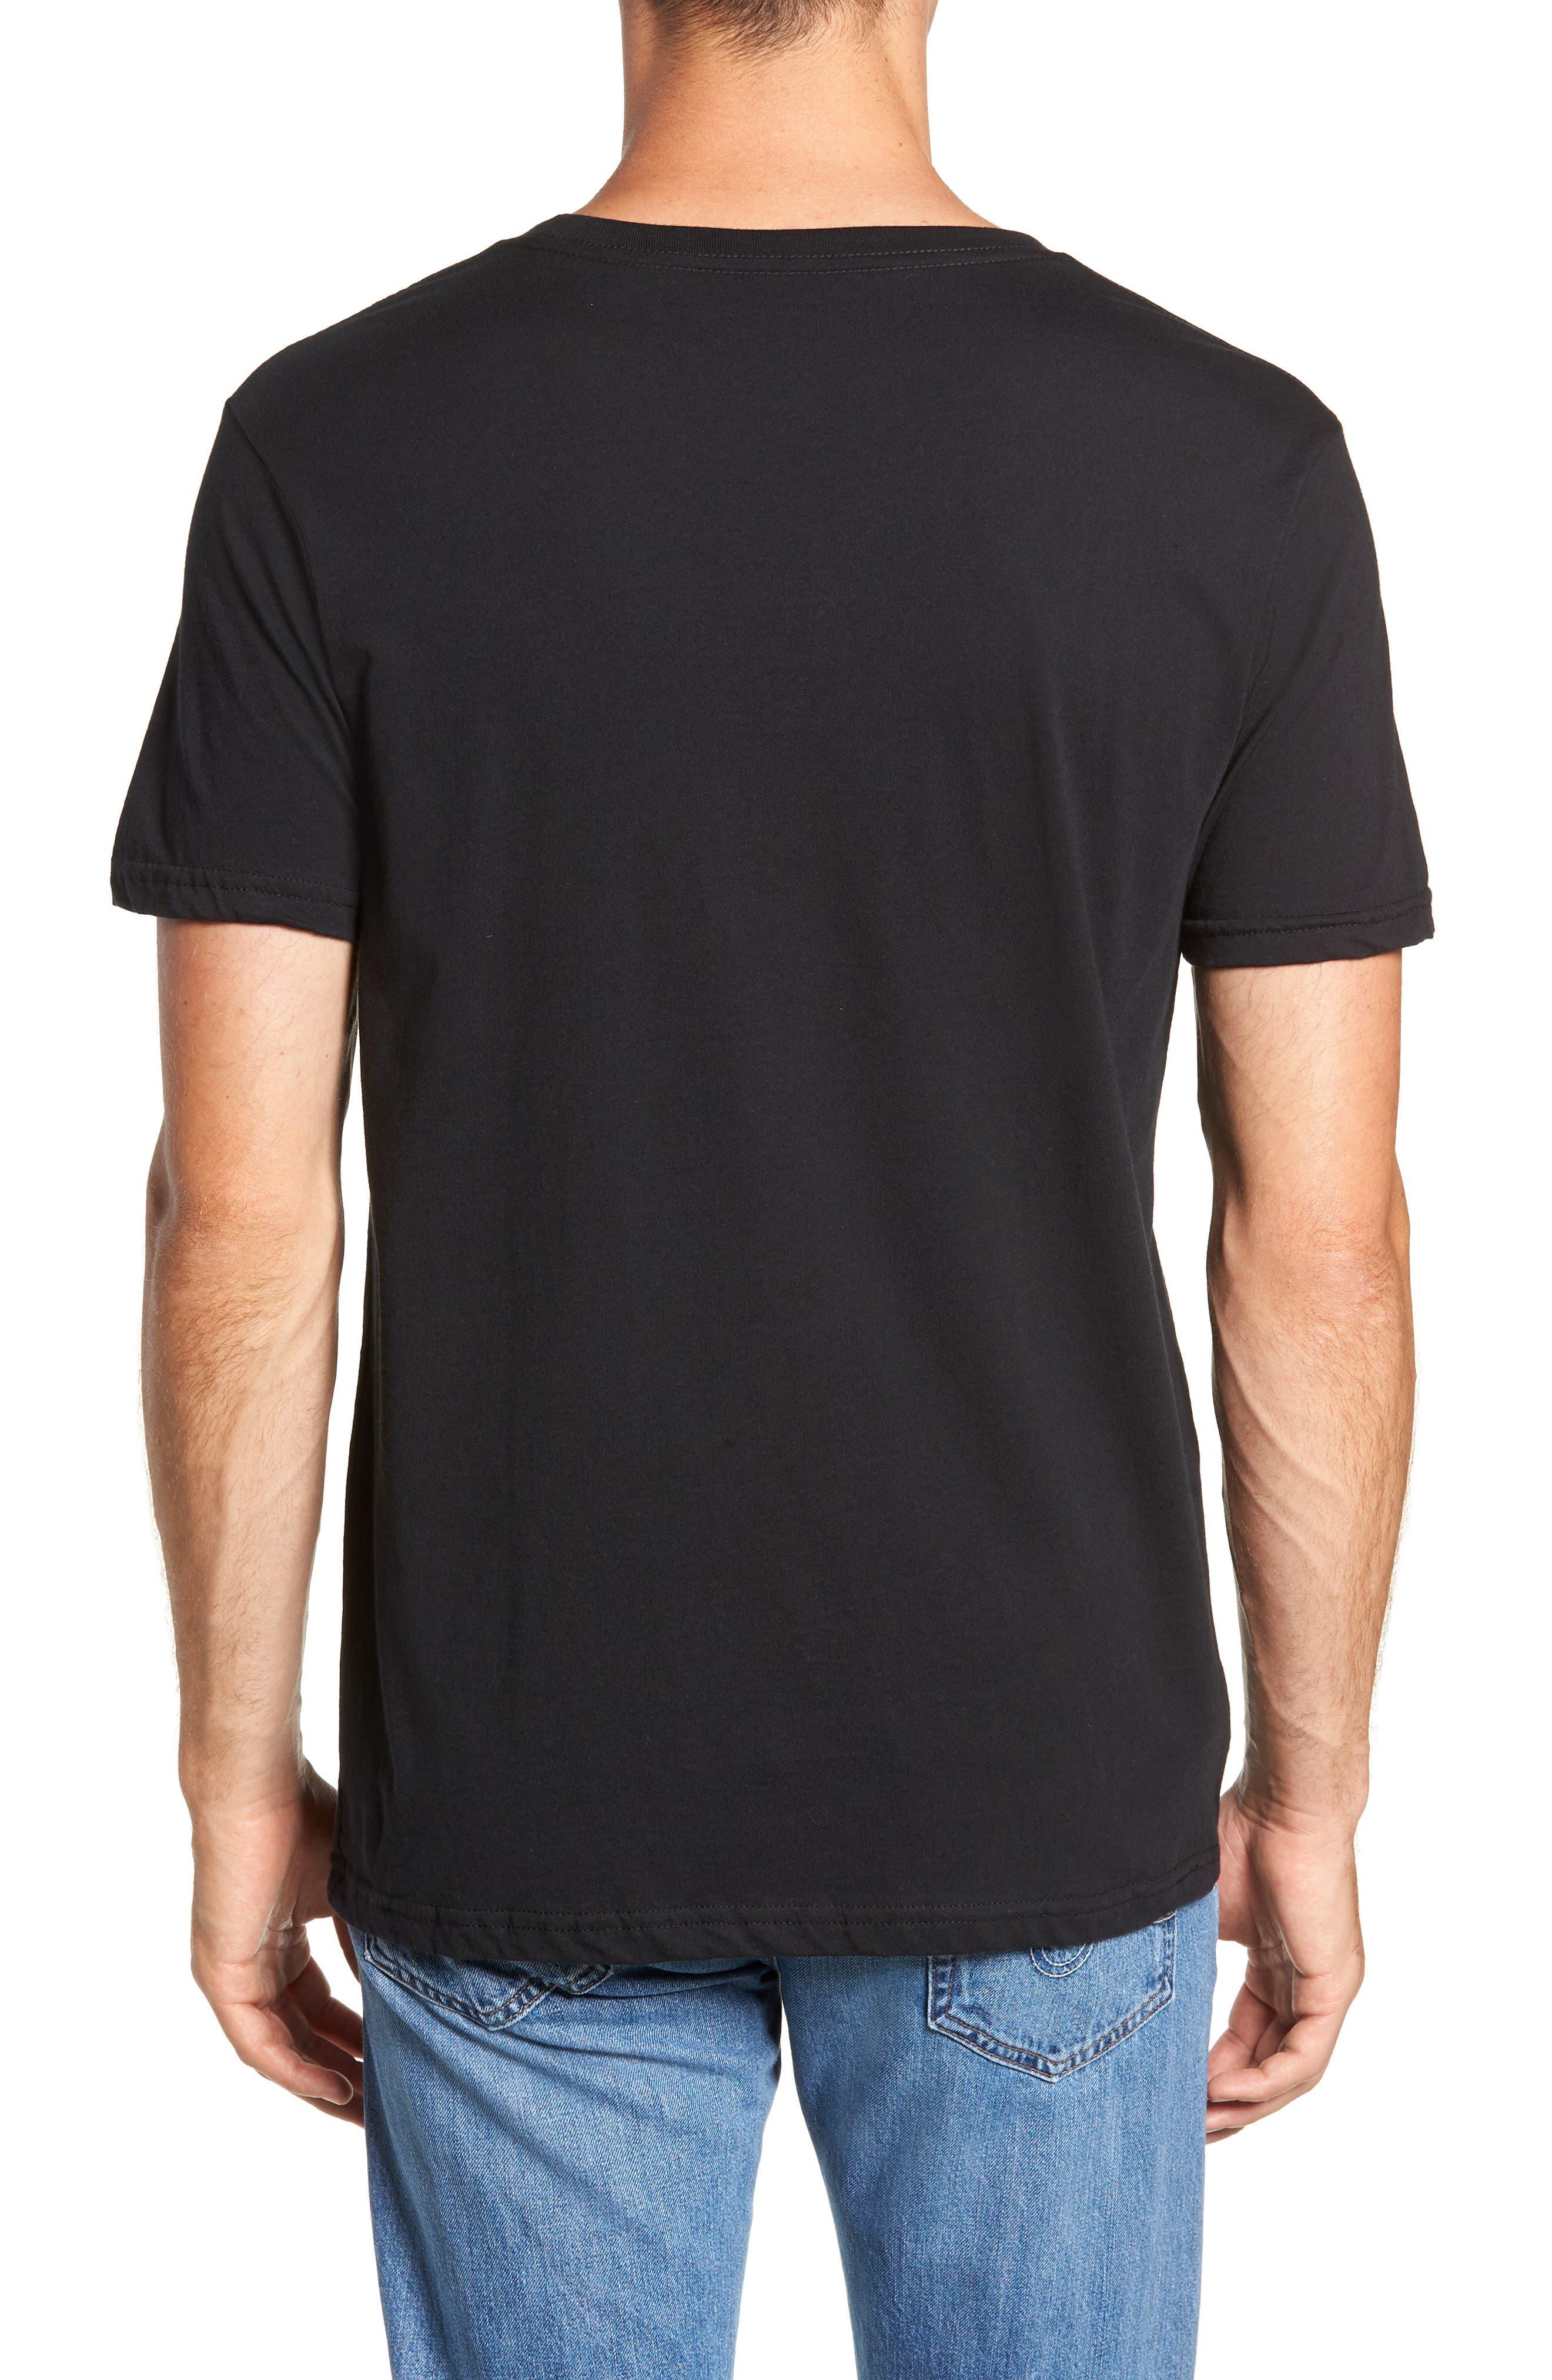 Geologers Organic Cotton T-Shirt,                             Alternate thumbnail 2, color,                             BLACK